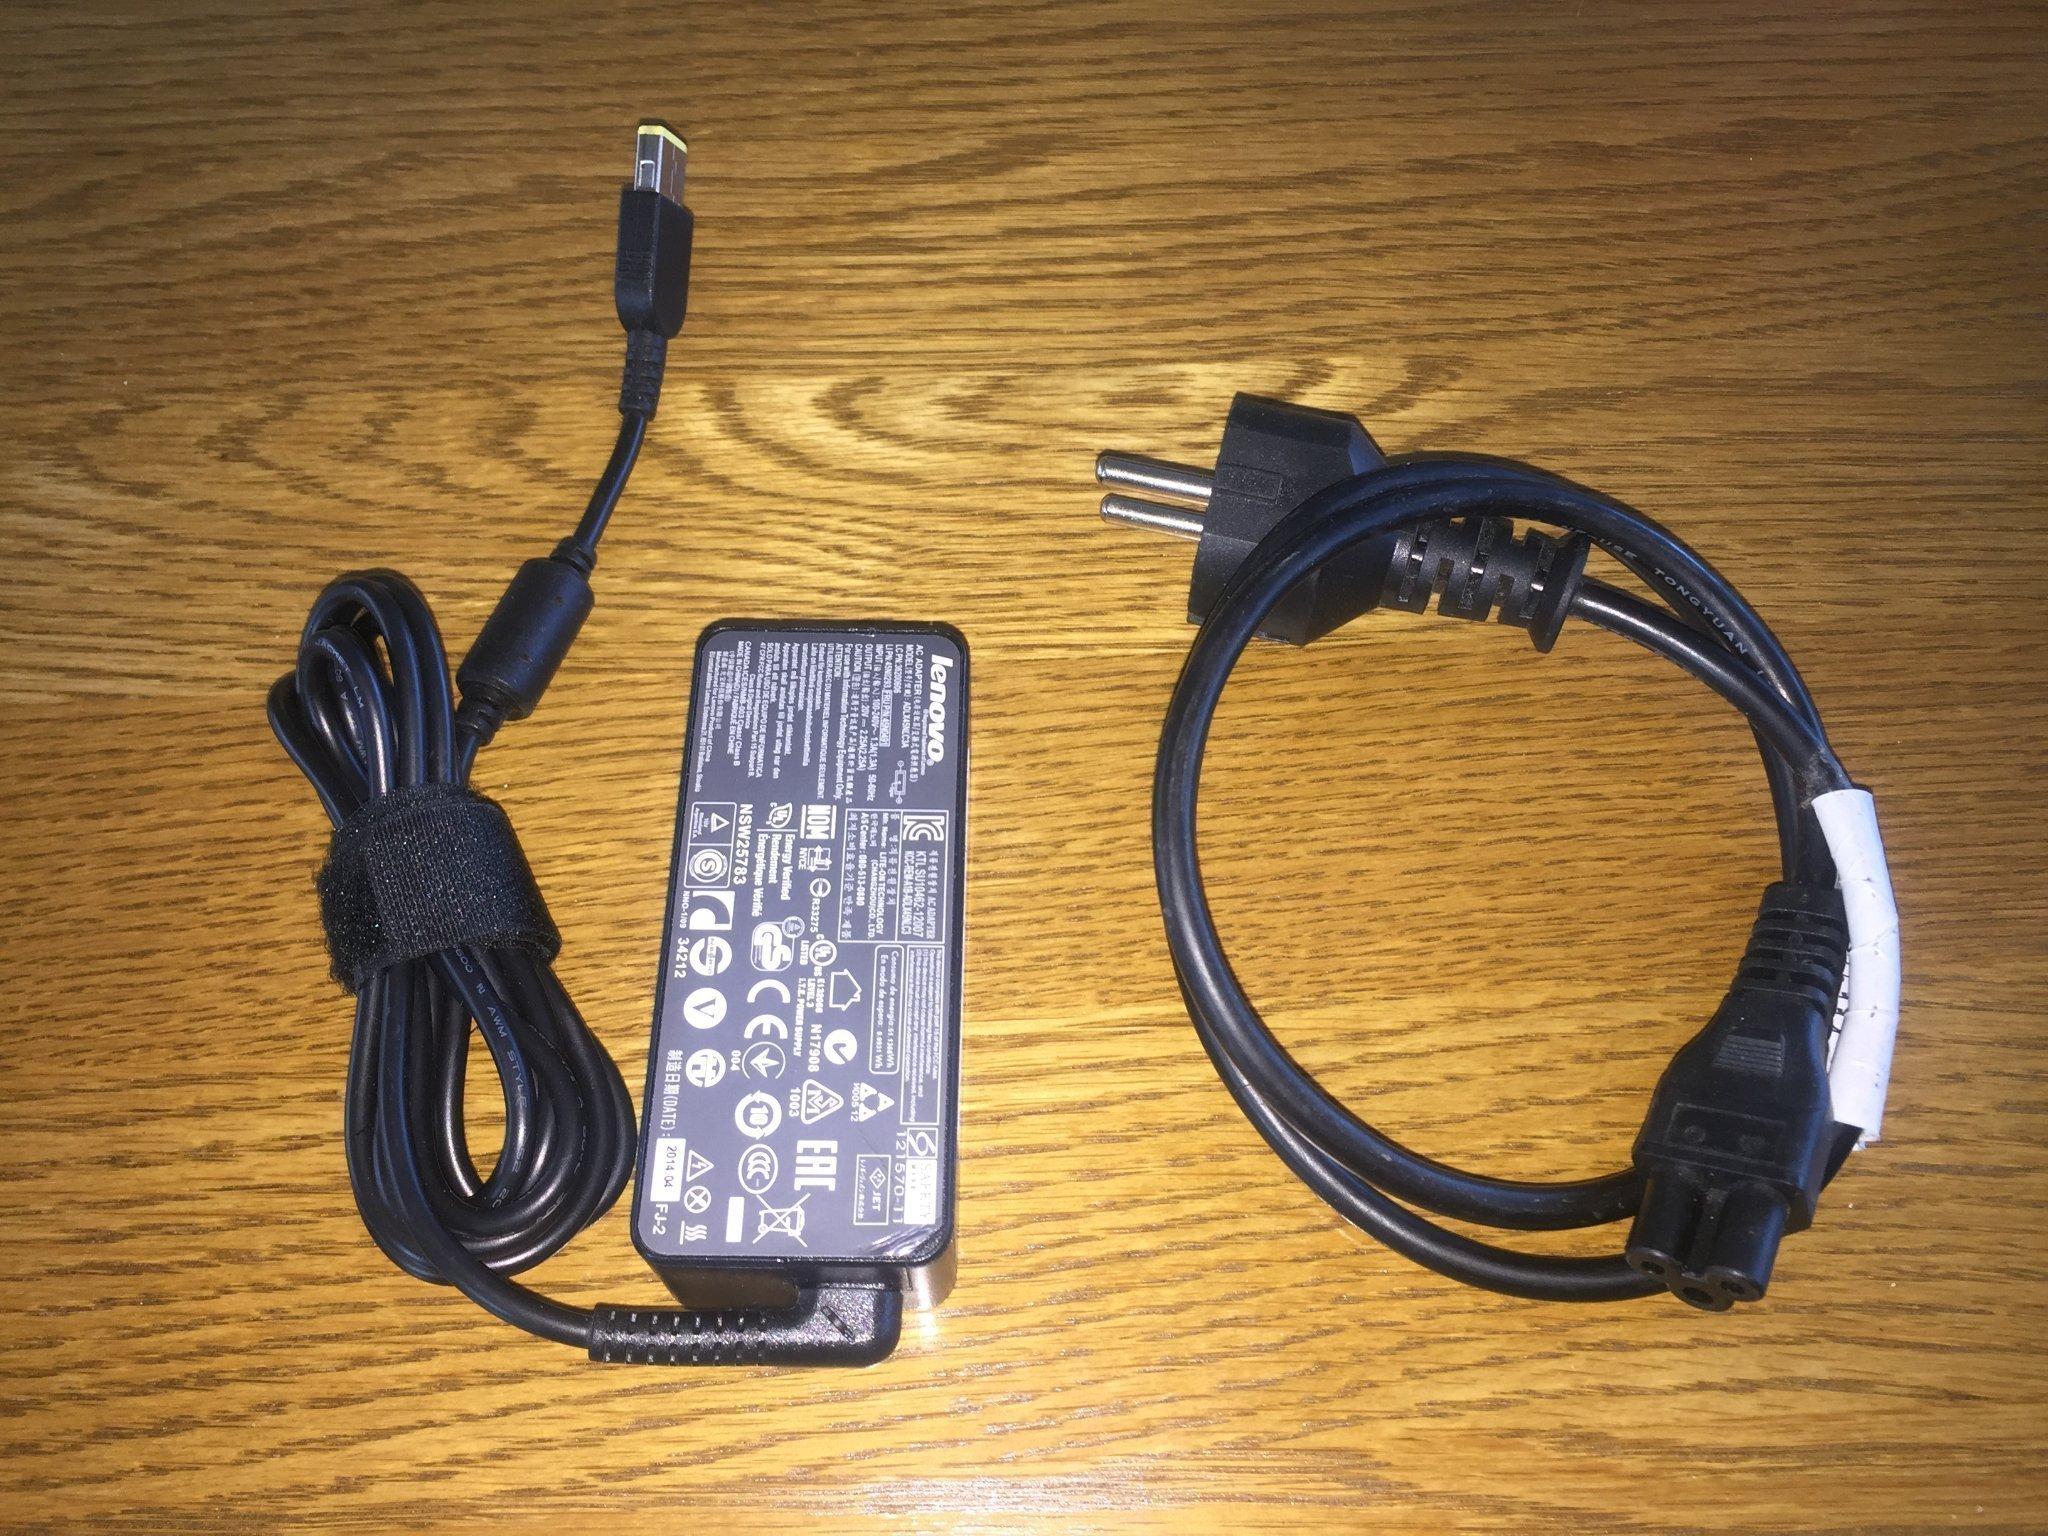 IBM Lenovo Thinkpad Laddare Original, 45W, 20V. Passar T440, Helix, Yoga mfl.